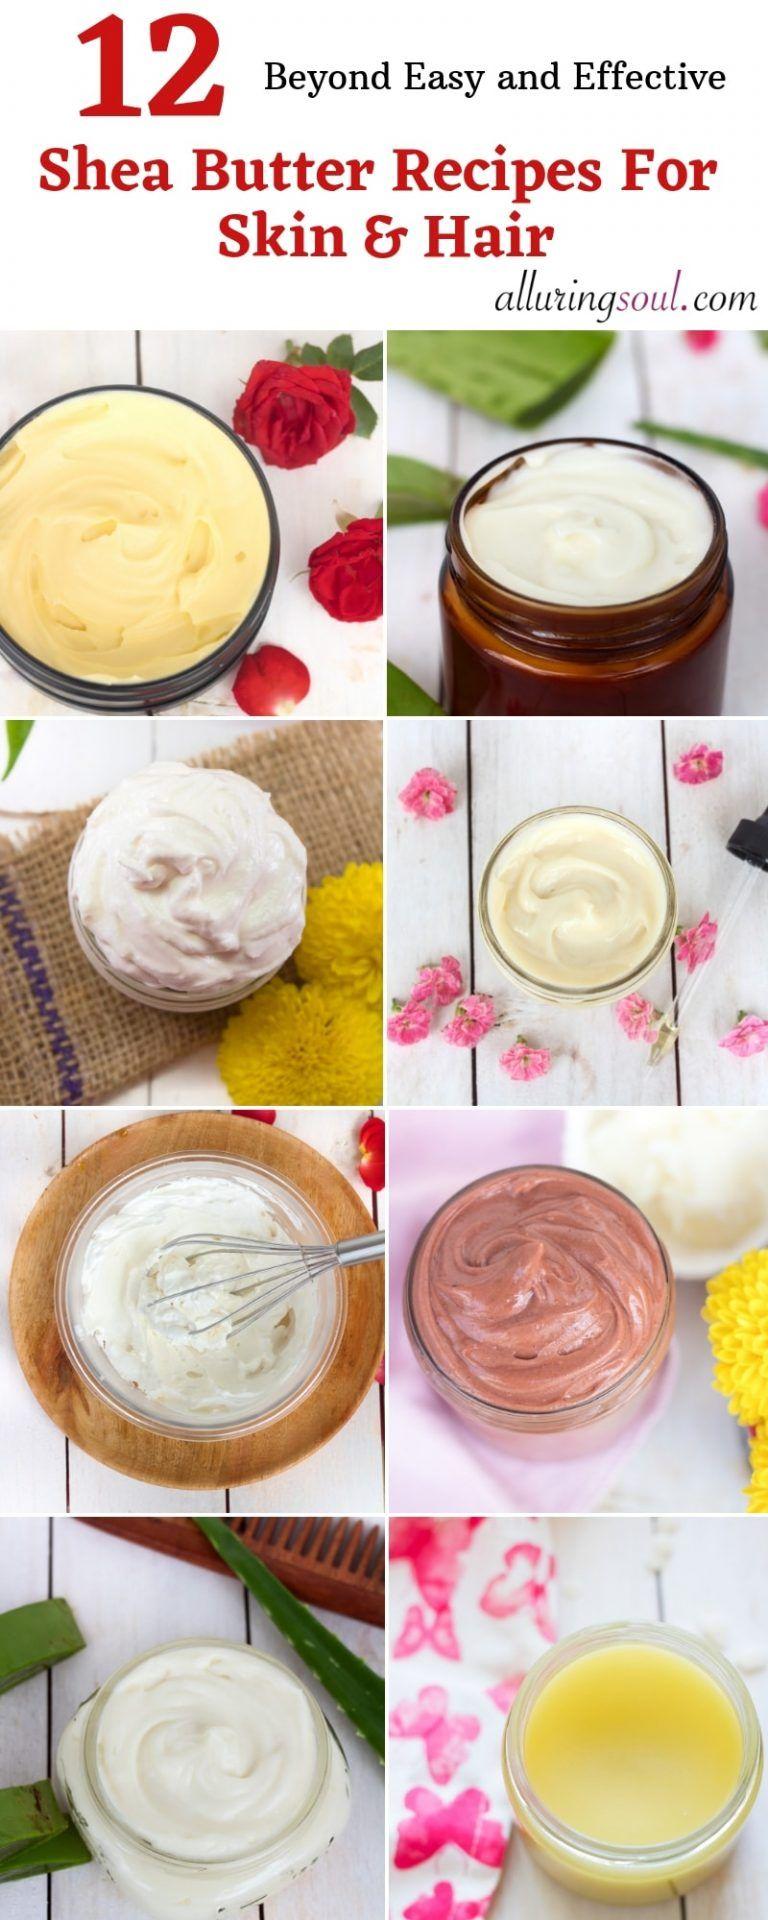 12 Shea Butter Recipes For Skin & Hair (Beyond Easy Shea